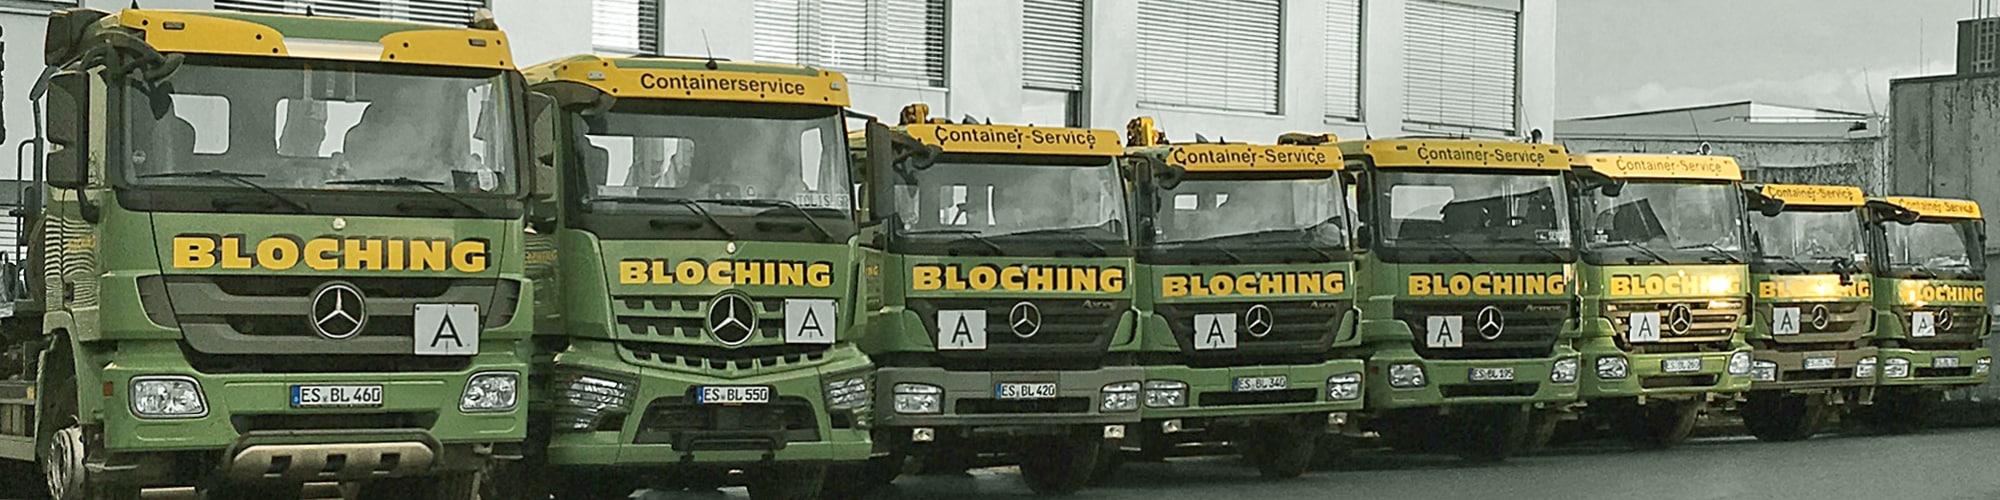 Entsorgungsbetrieb Bloching